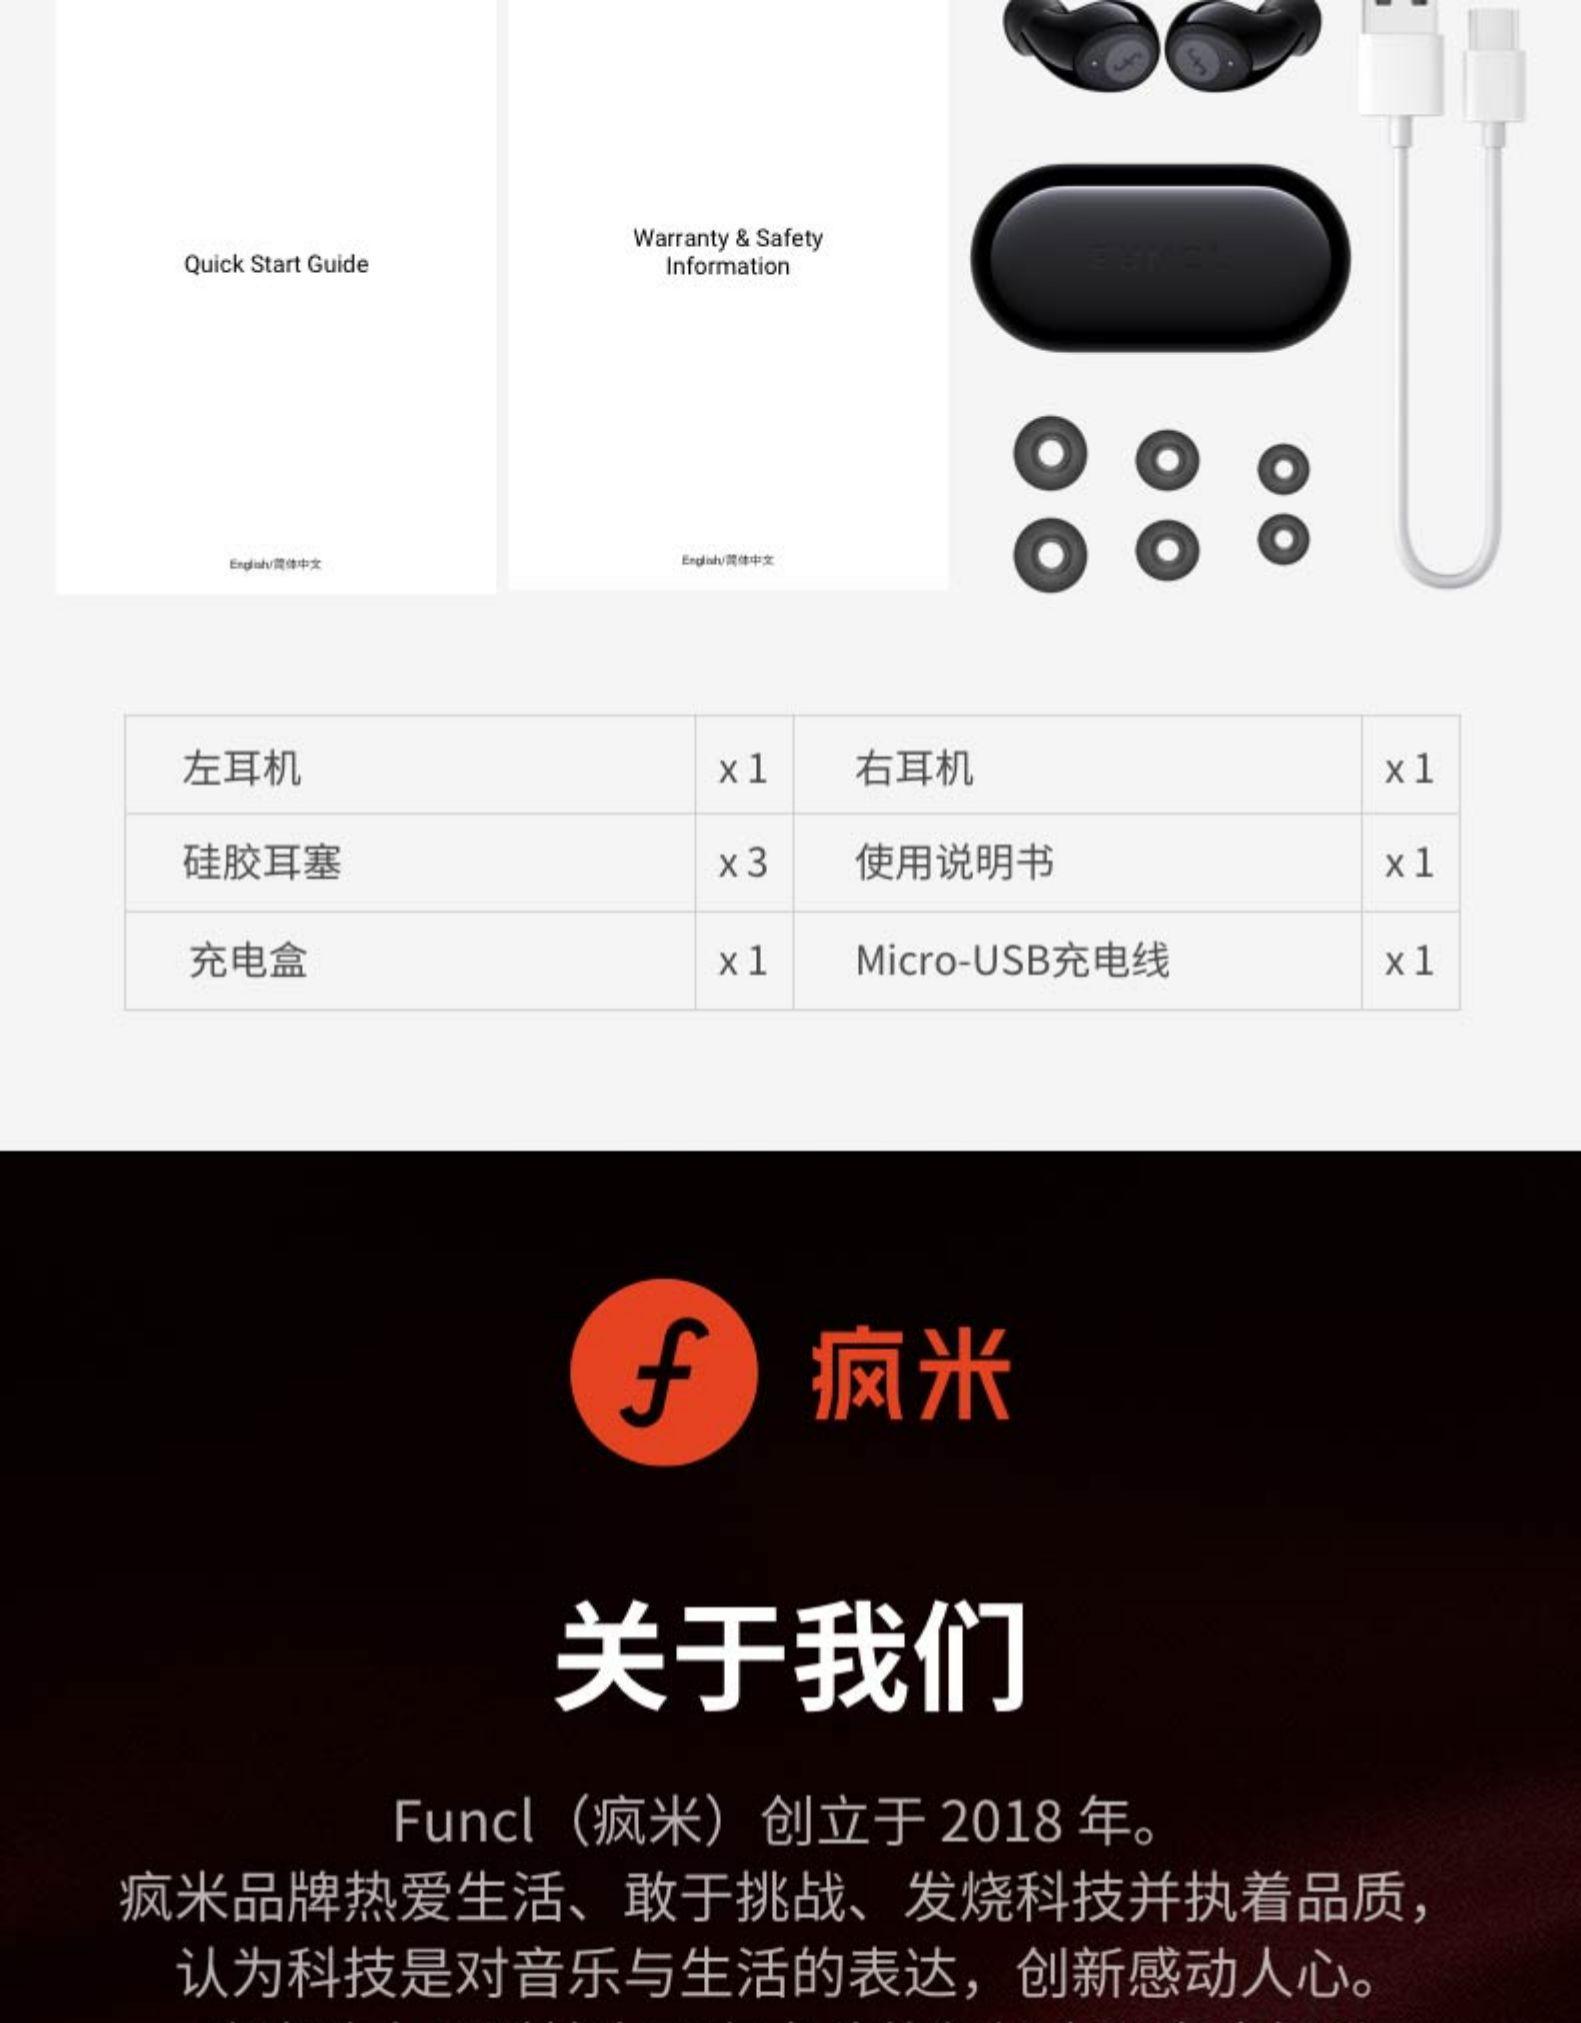 Warranty& SafetyQuick Start GuideInformationEdad中文左耳机X1右耳机x 1硅胶耳塞X3使用说明书x 1充电盒X1Mcro-USB充电线x 1疯米关于我们Func(疯米)创立于2018年。疯米品牌热爱生活、敢于挑战、发烧科技并执着品质,认为科技是对音乐与生活的表达,创新感动人心。-推好价 | 品质生活 精选好价